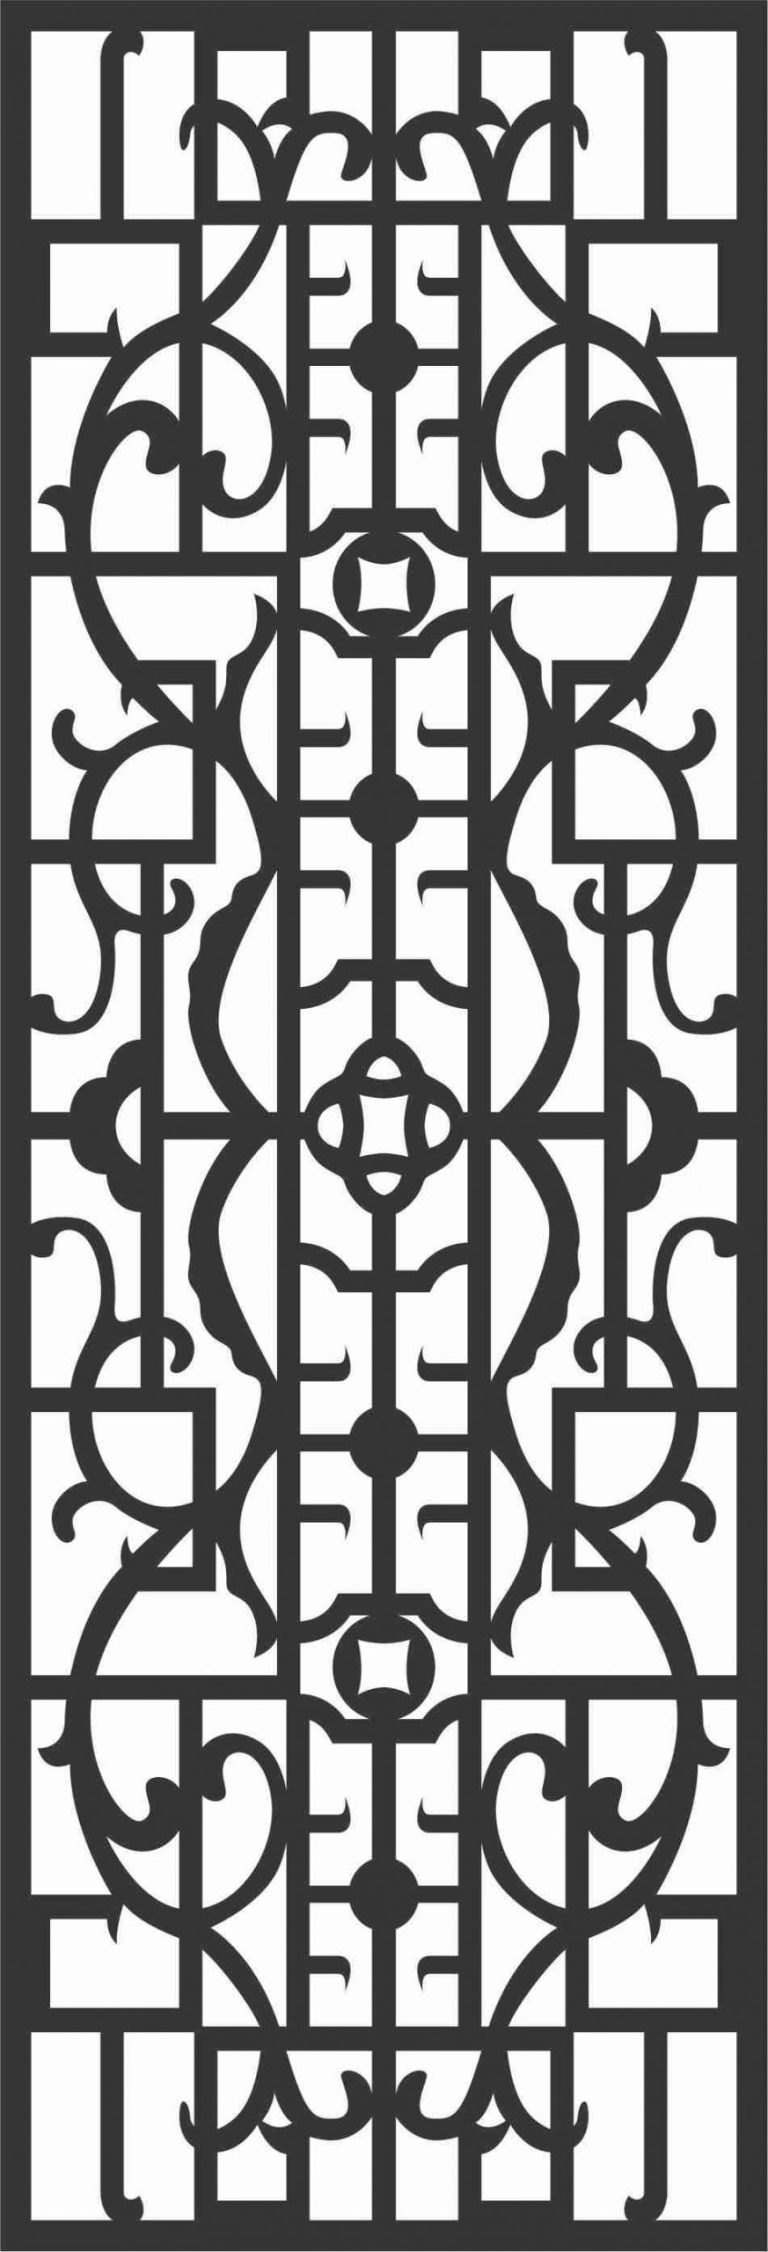 Screen Panel Patterns Seamless 20 Free DXF File